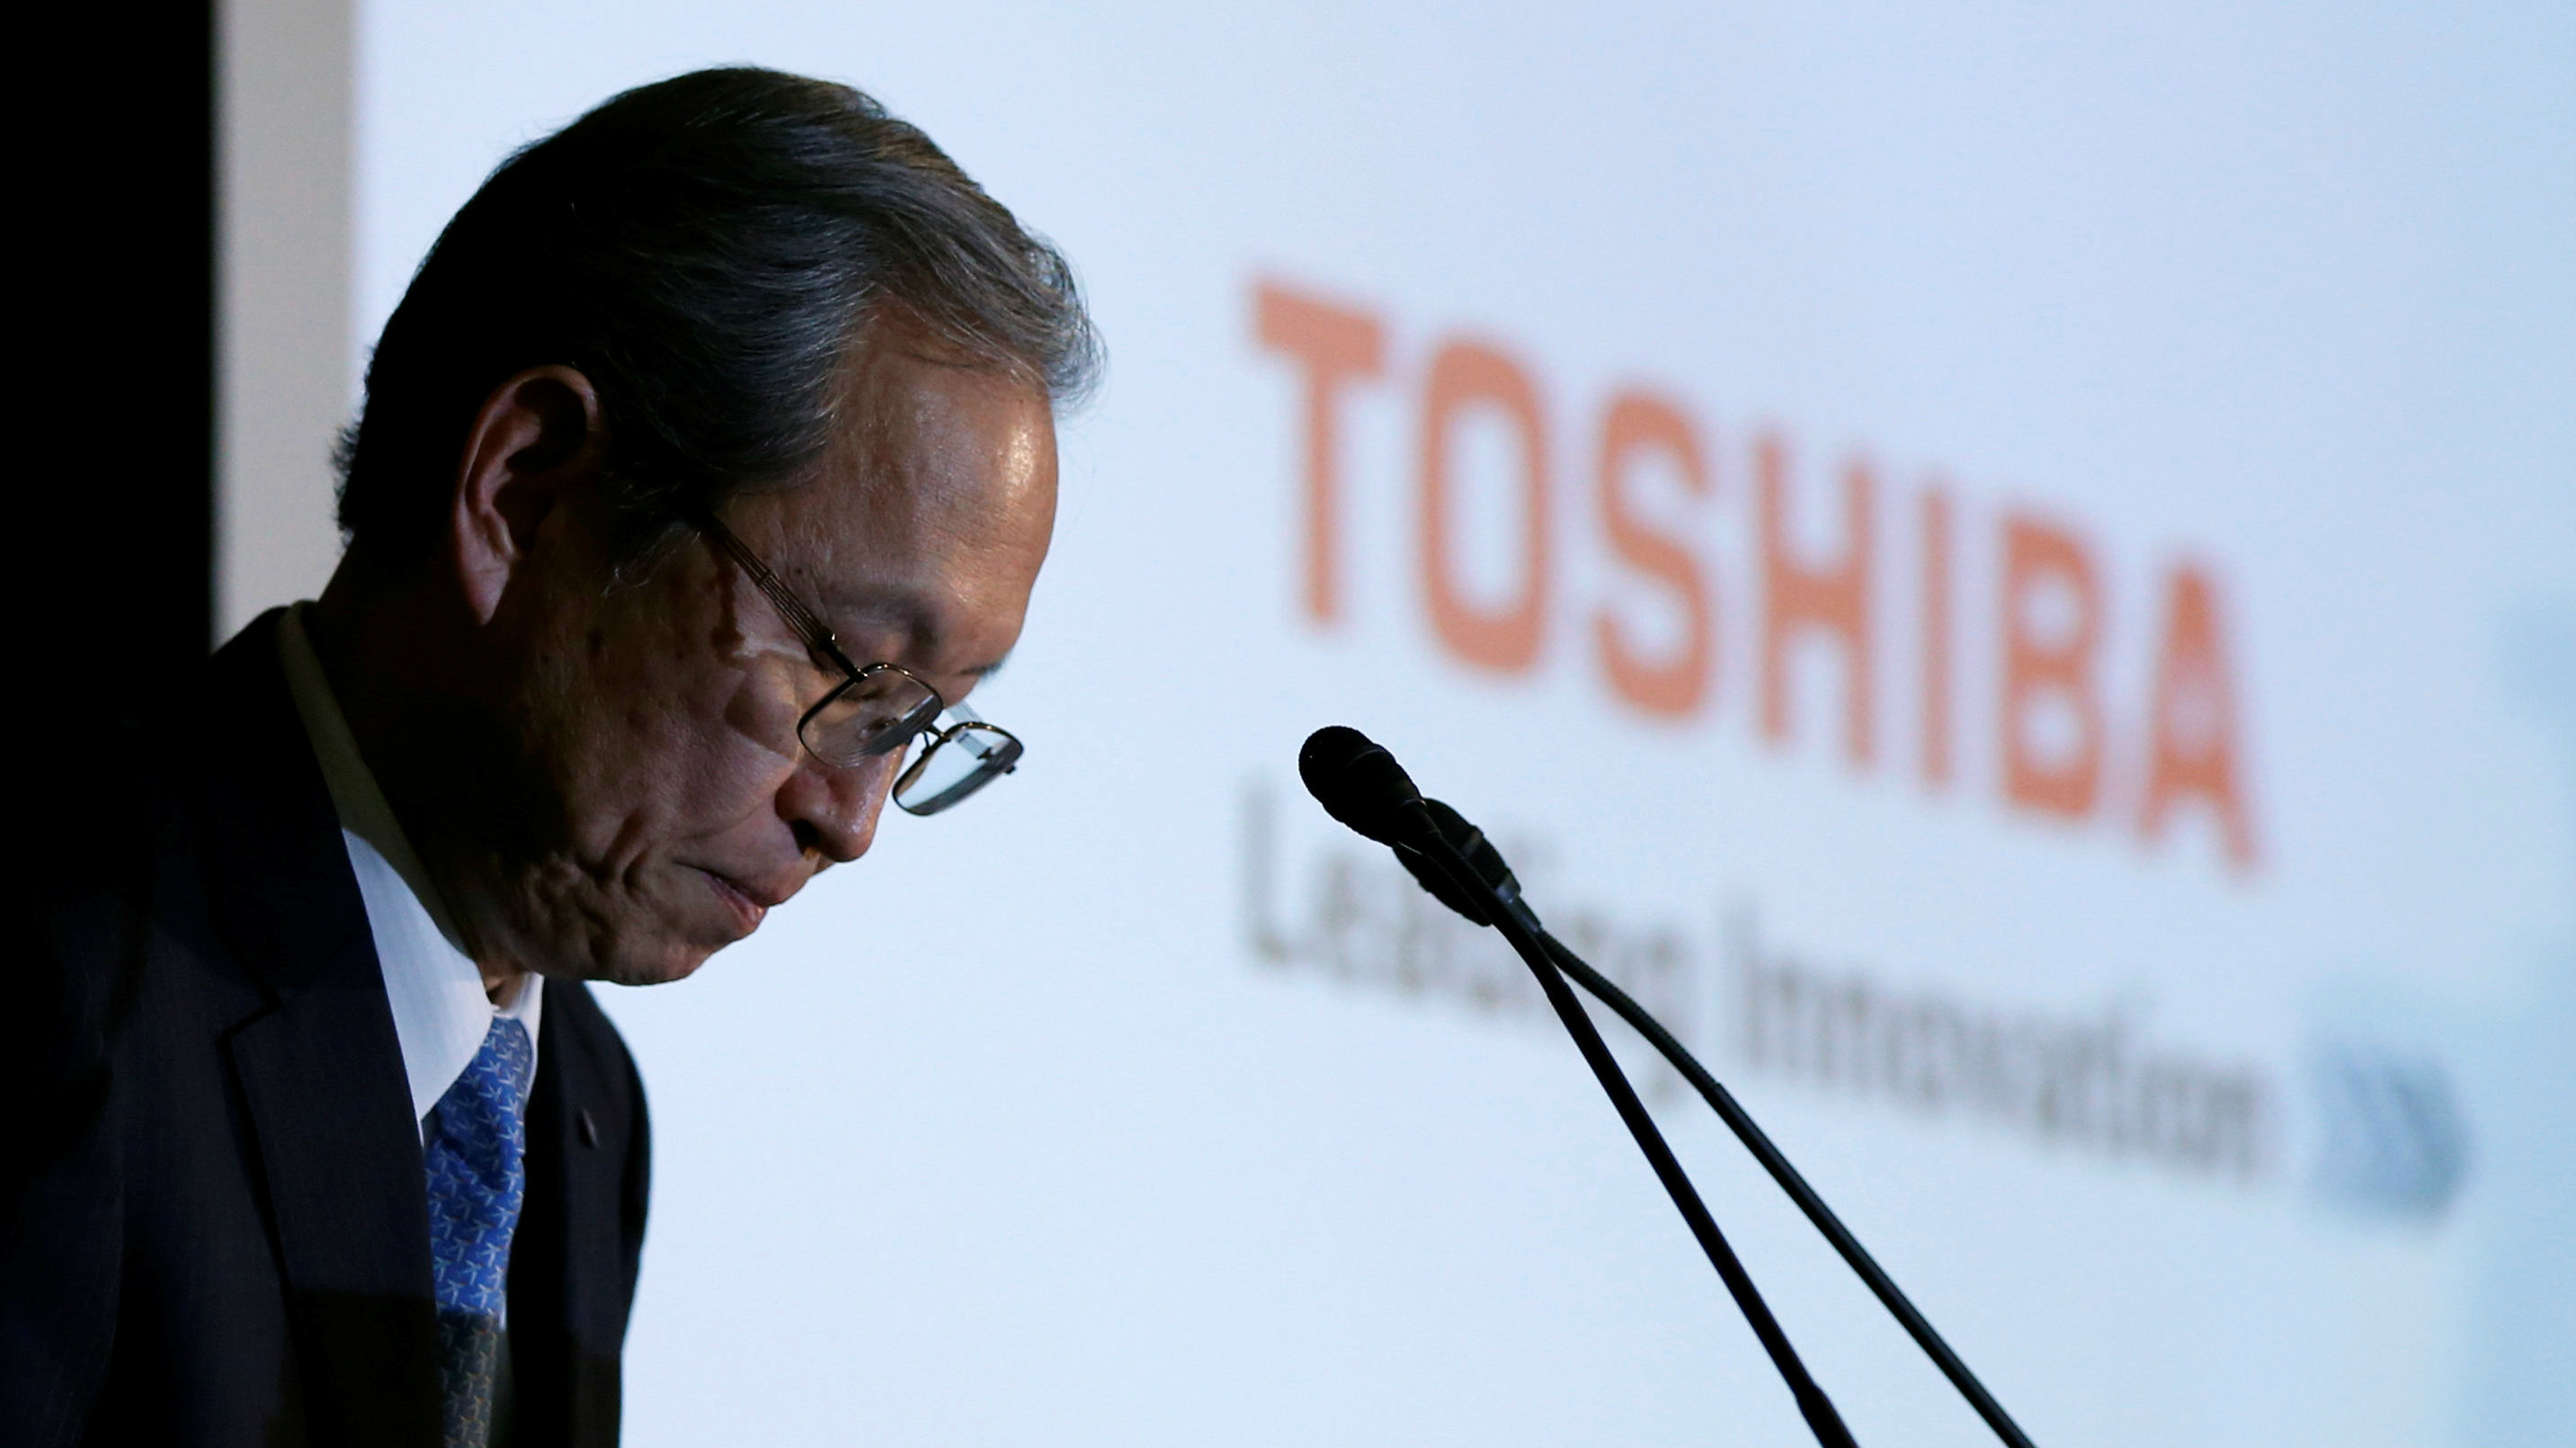 Toshiba Corp CEO Satoshi Tsunakawa bows as the start of a news conference at the company's headquarters in Tokyo, Japan REUTERS/Toru Hanai